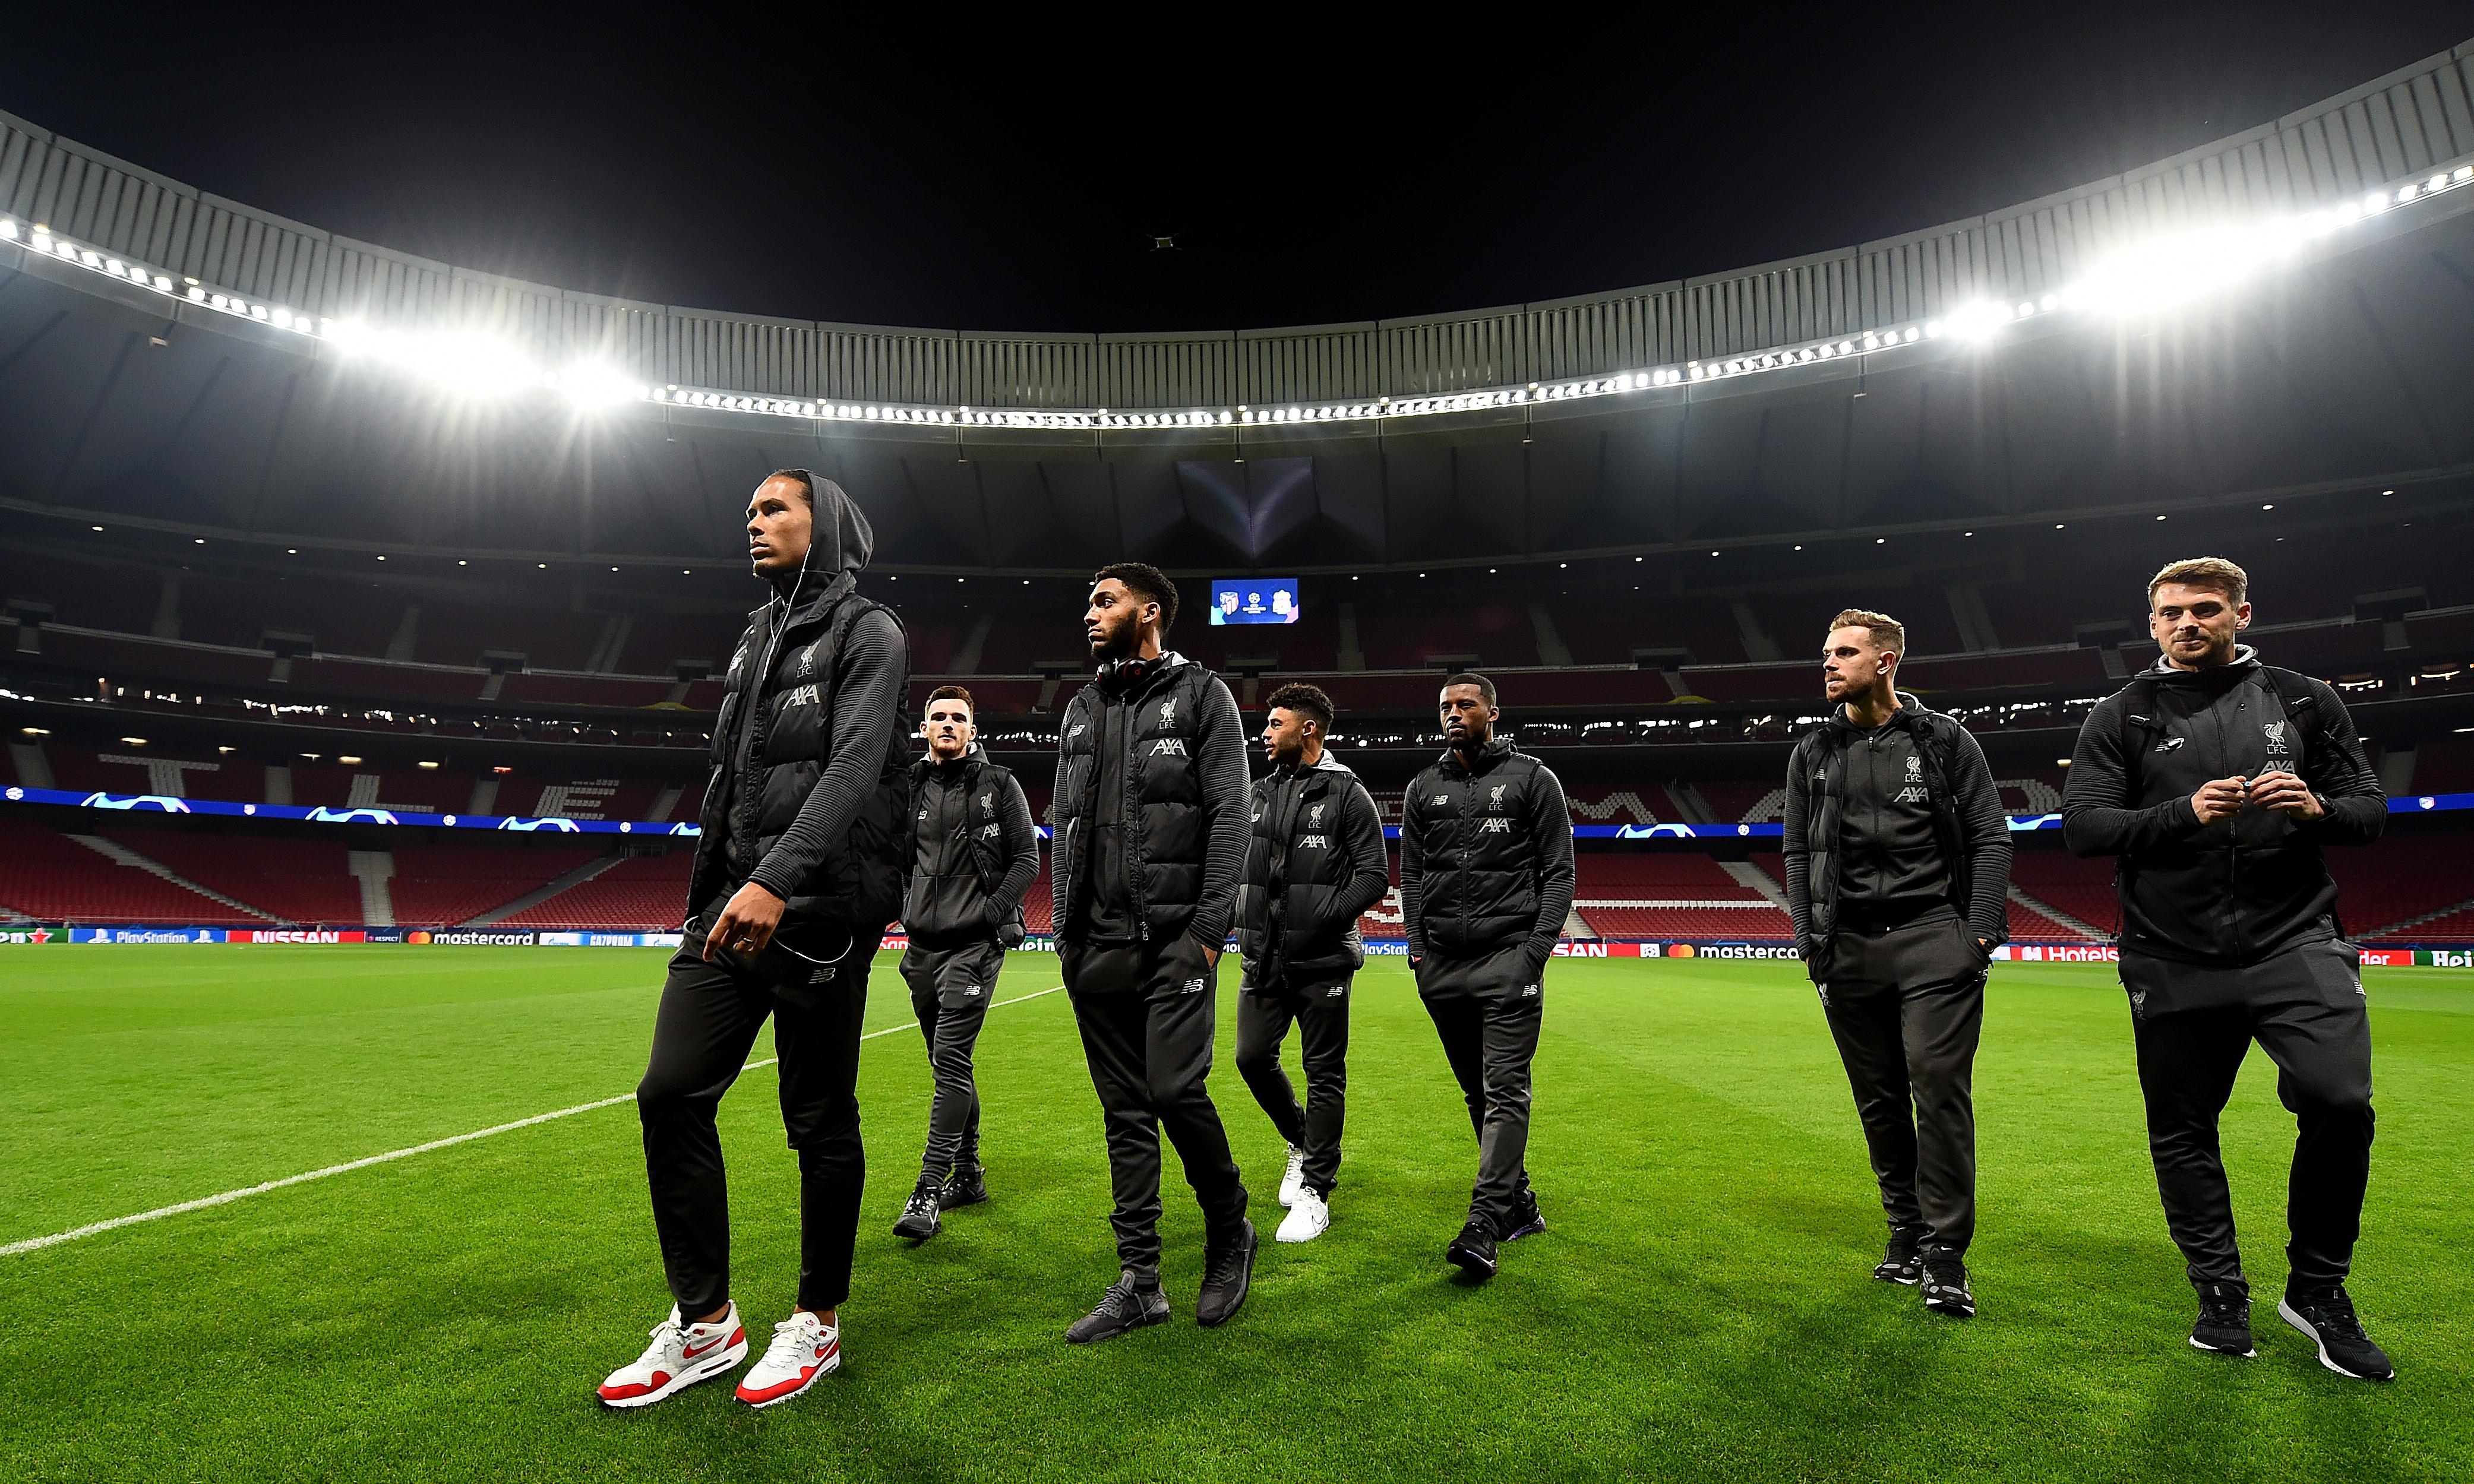 Jürgen Klopp wants Liverpool to show worth as European contenders